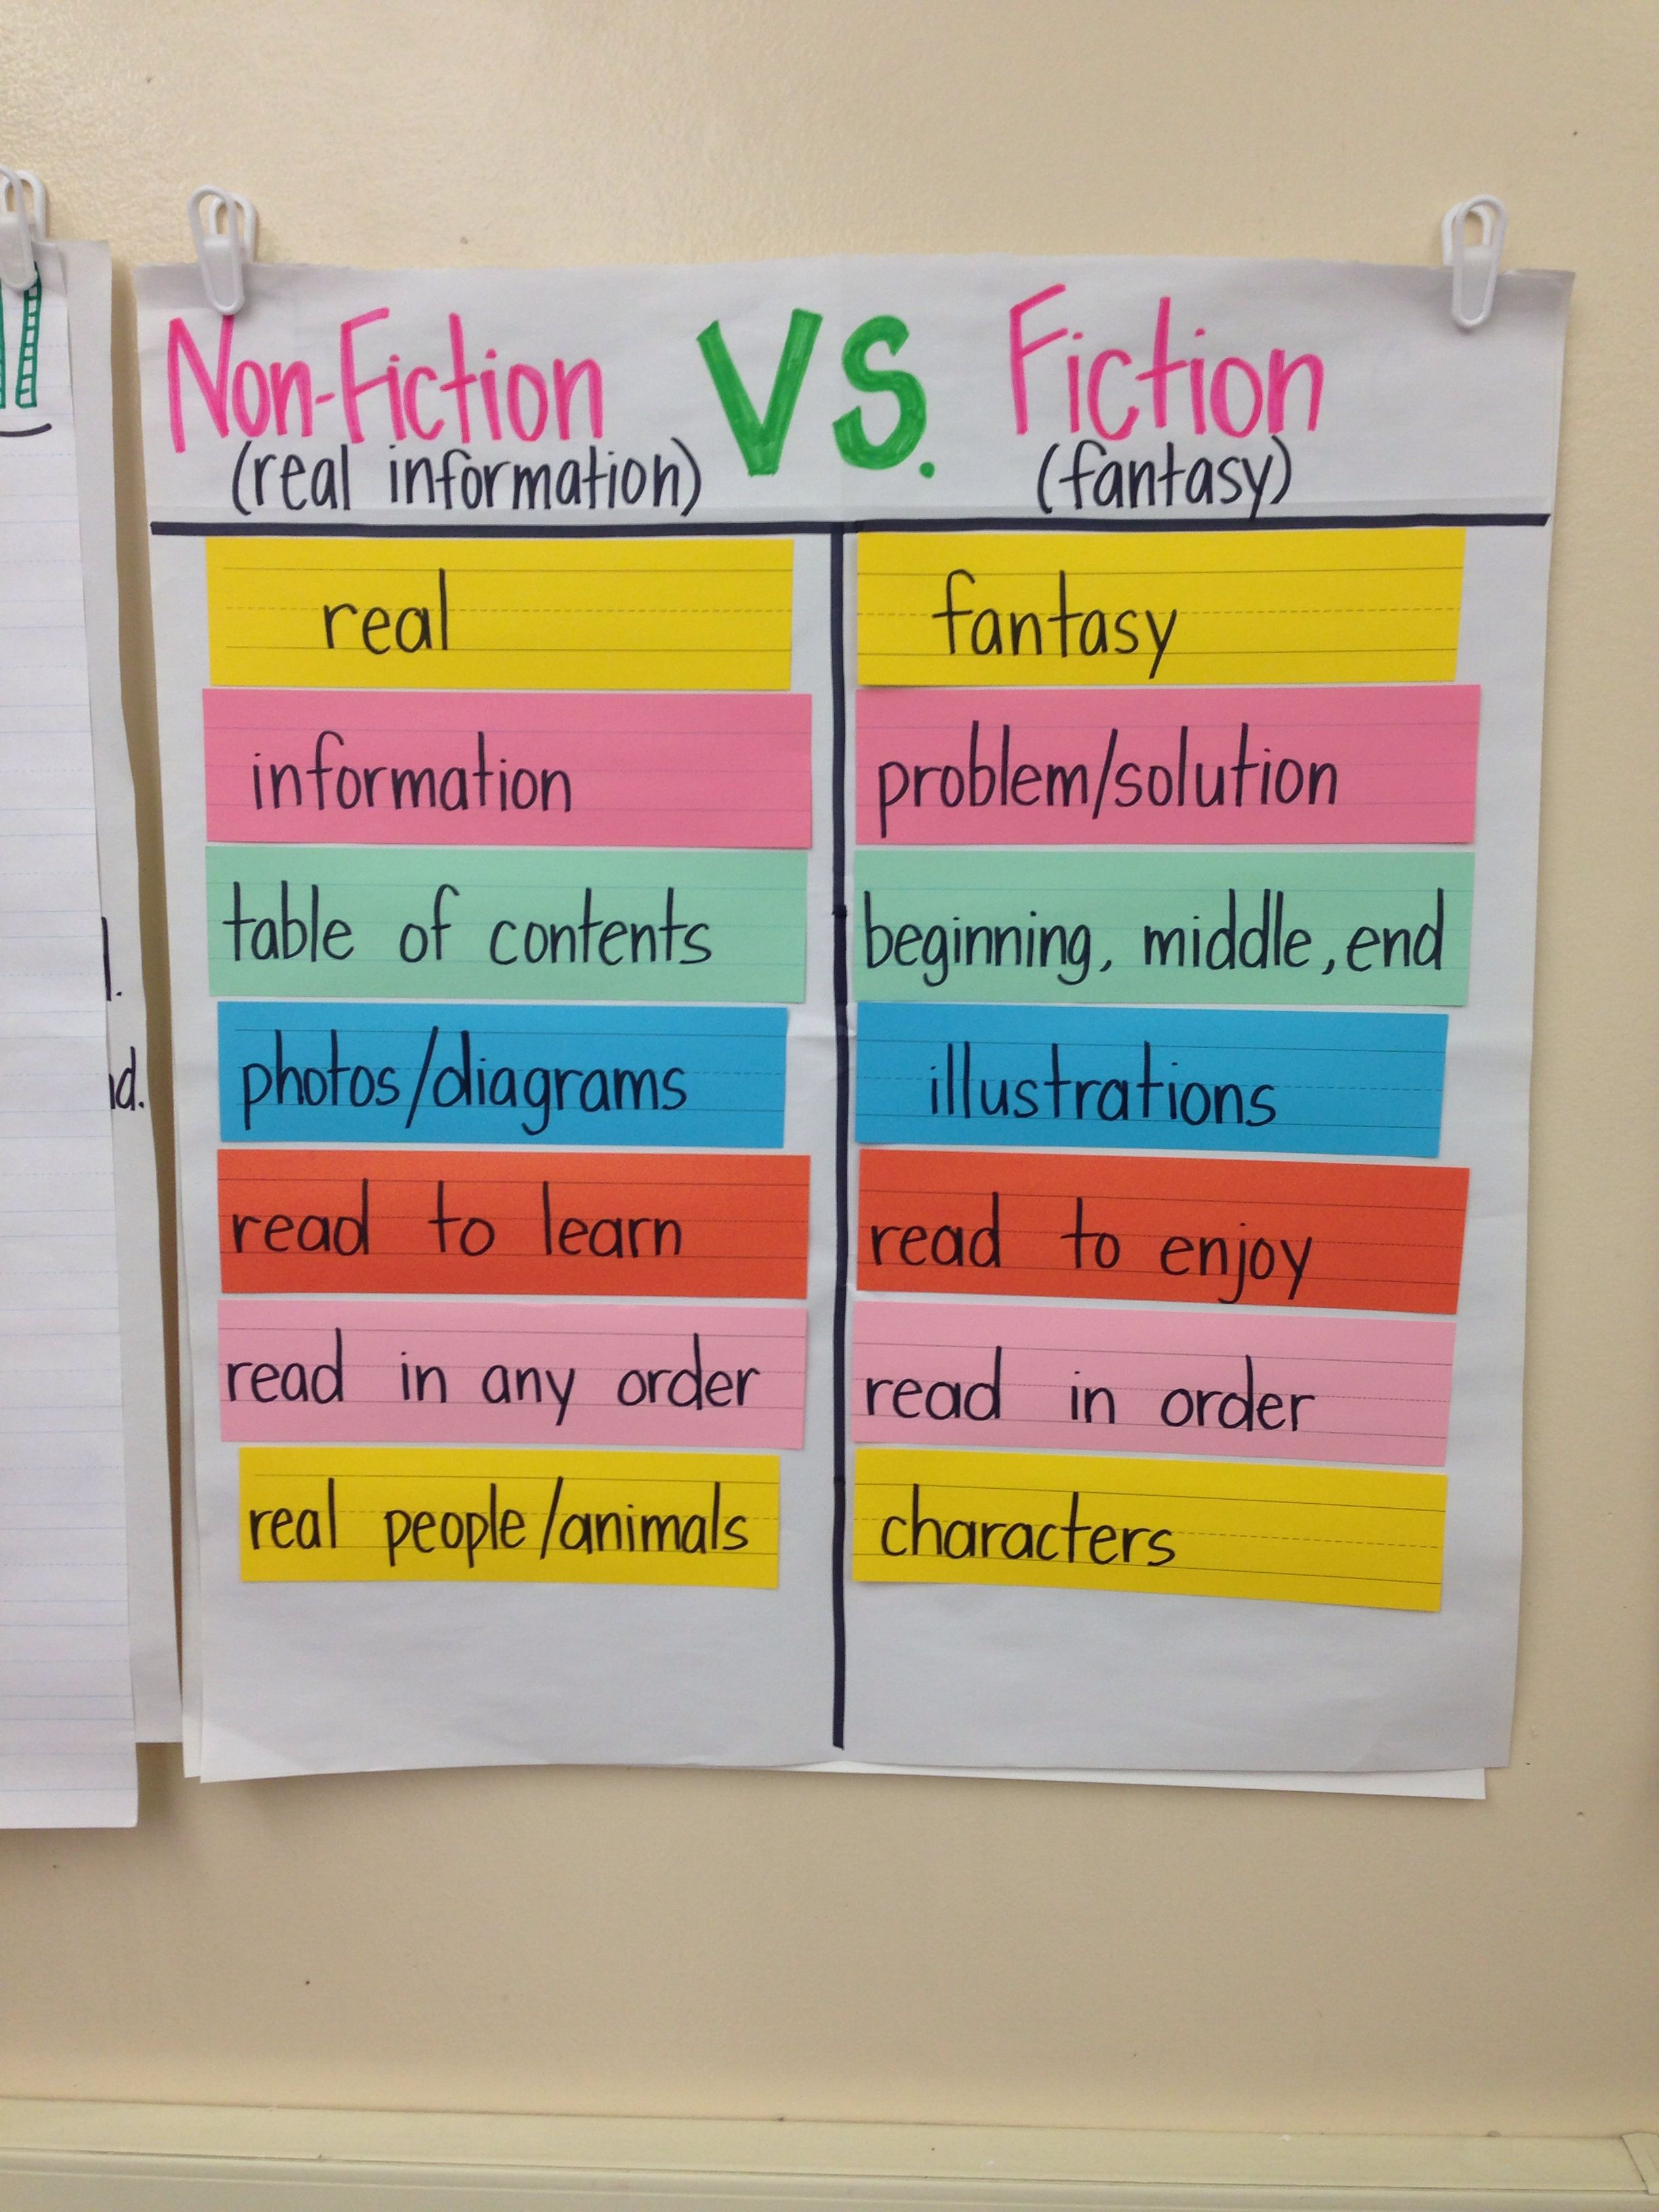 fiction vs nonfiction venn diagram simplicity regent lawn tractor wiring non school reading pinterest